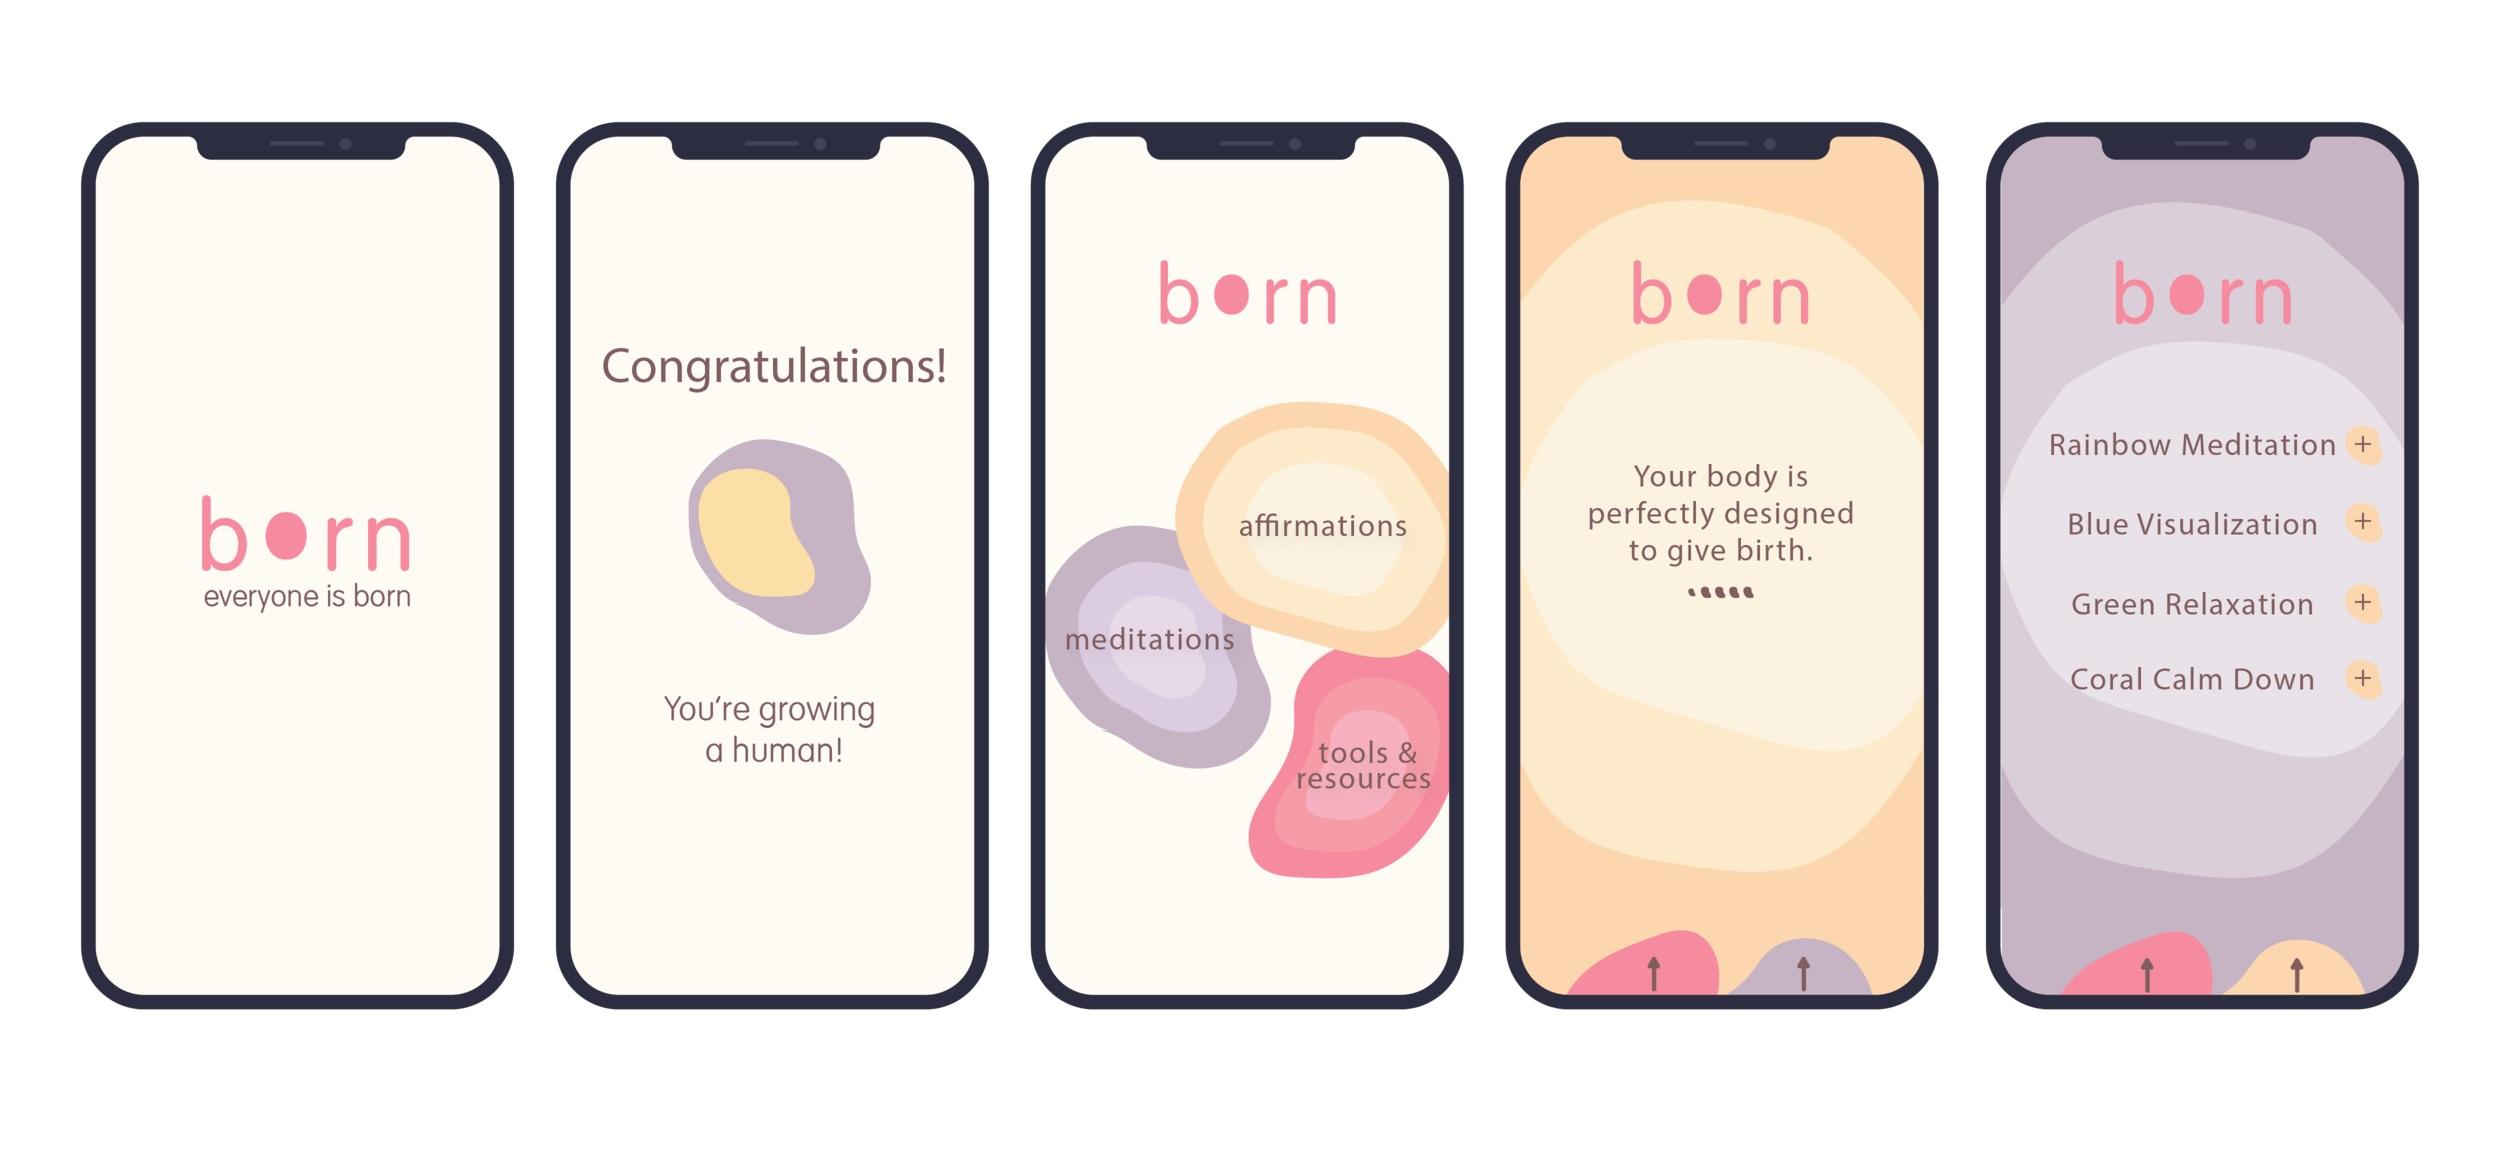 born+app+layout-01.jpg